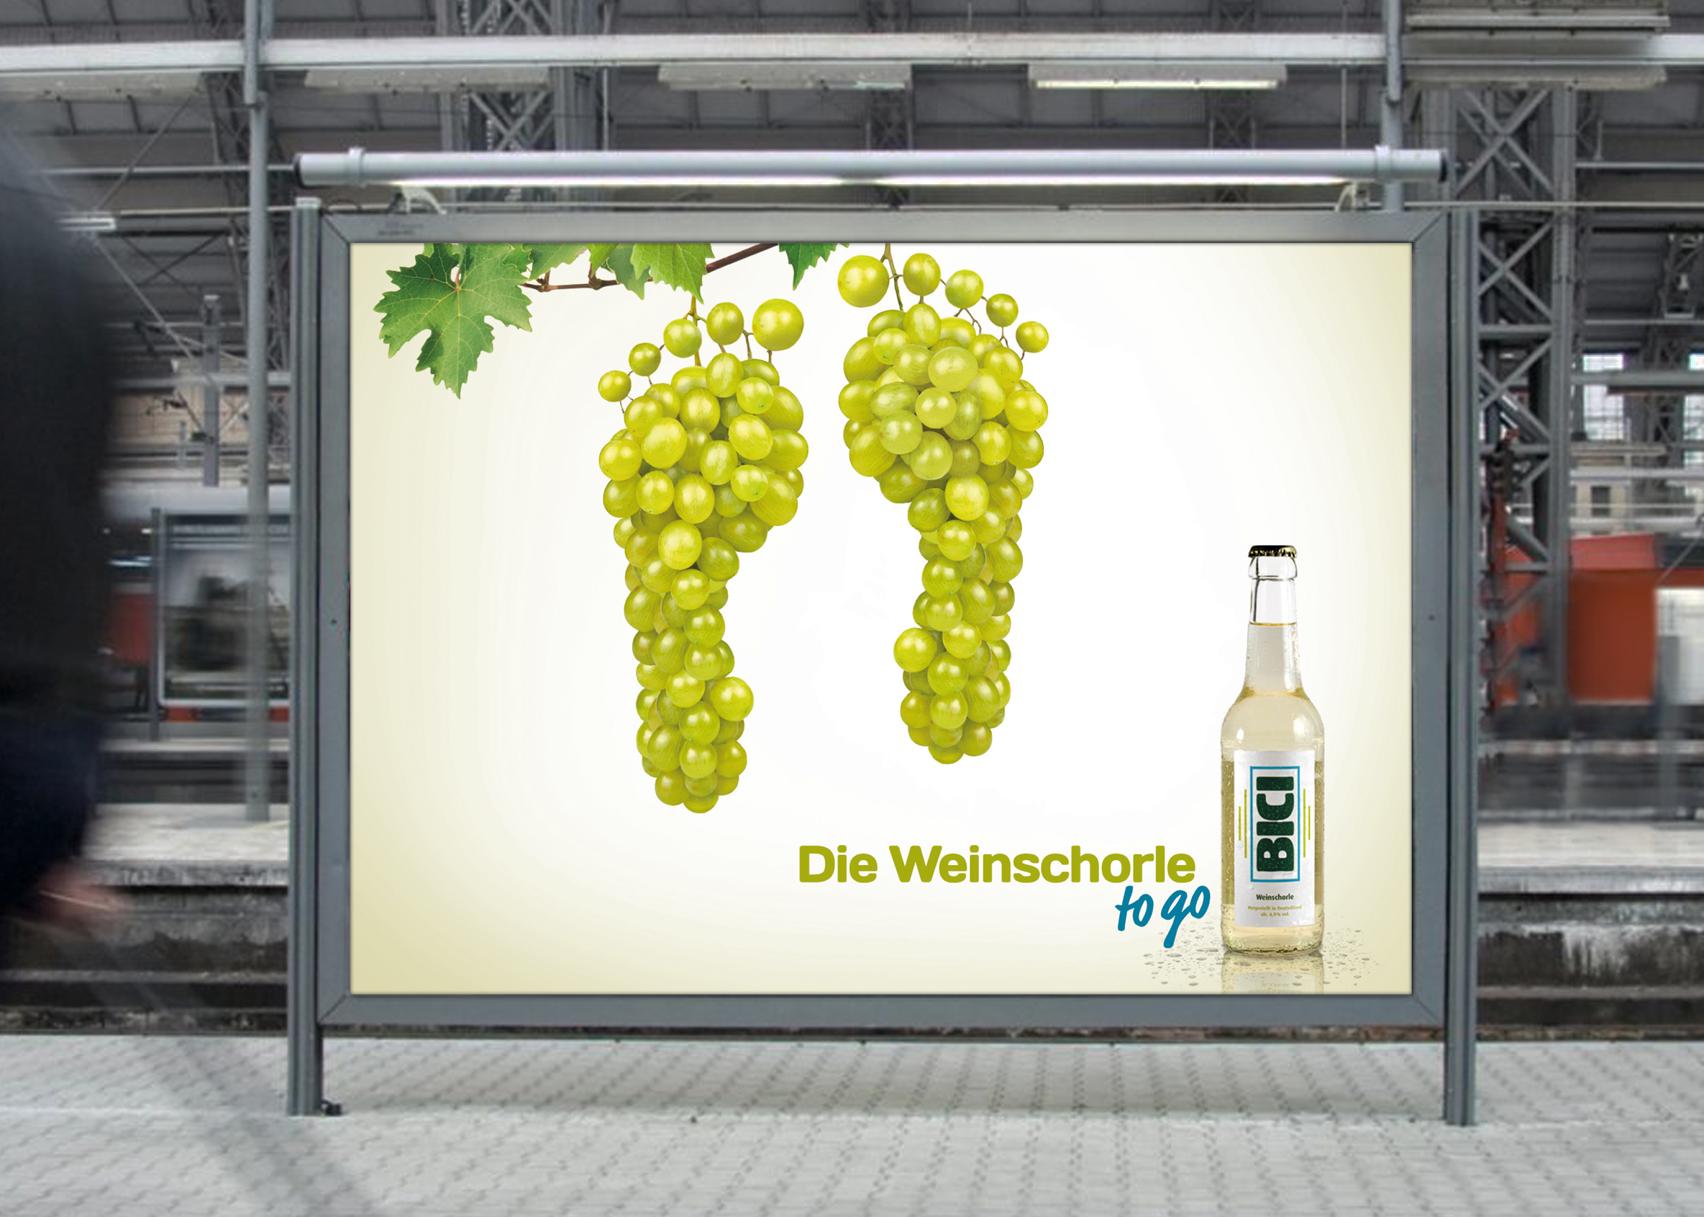 BICI Weinschorle Poster